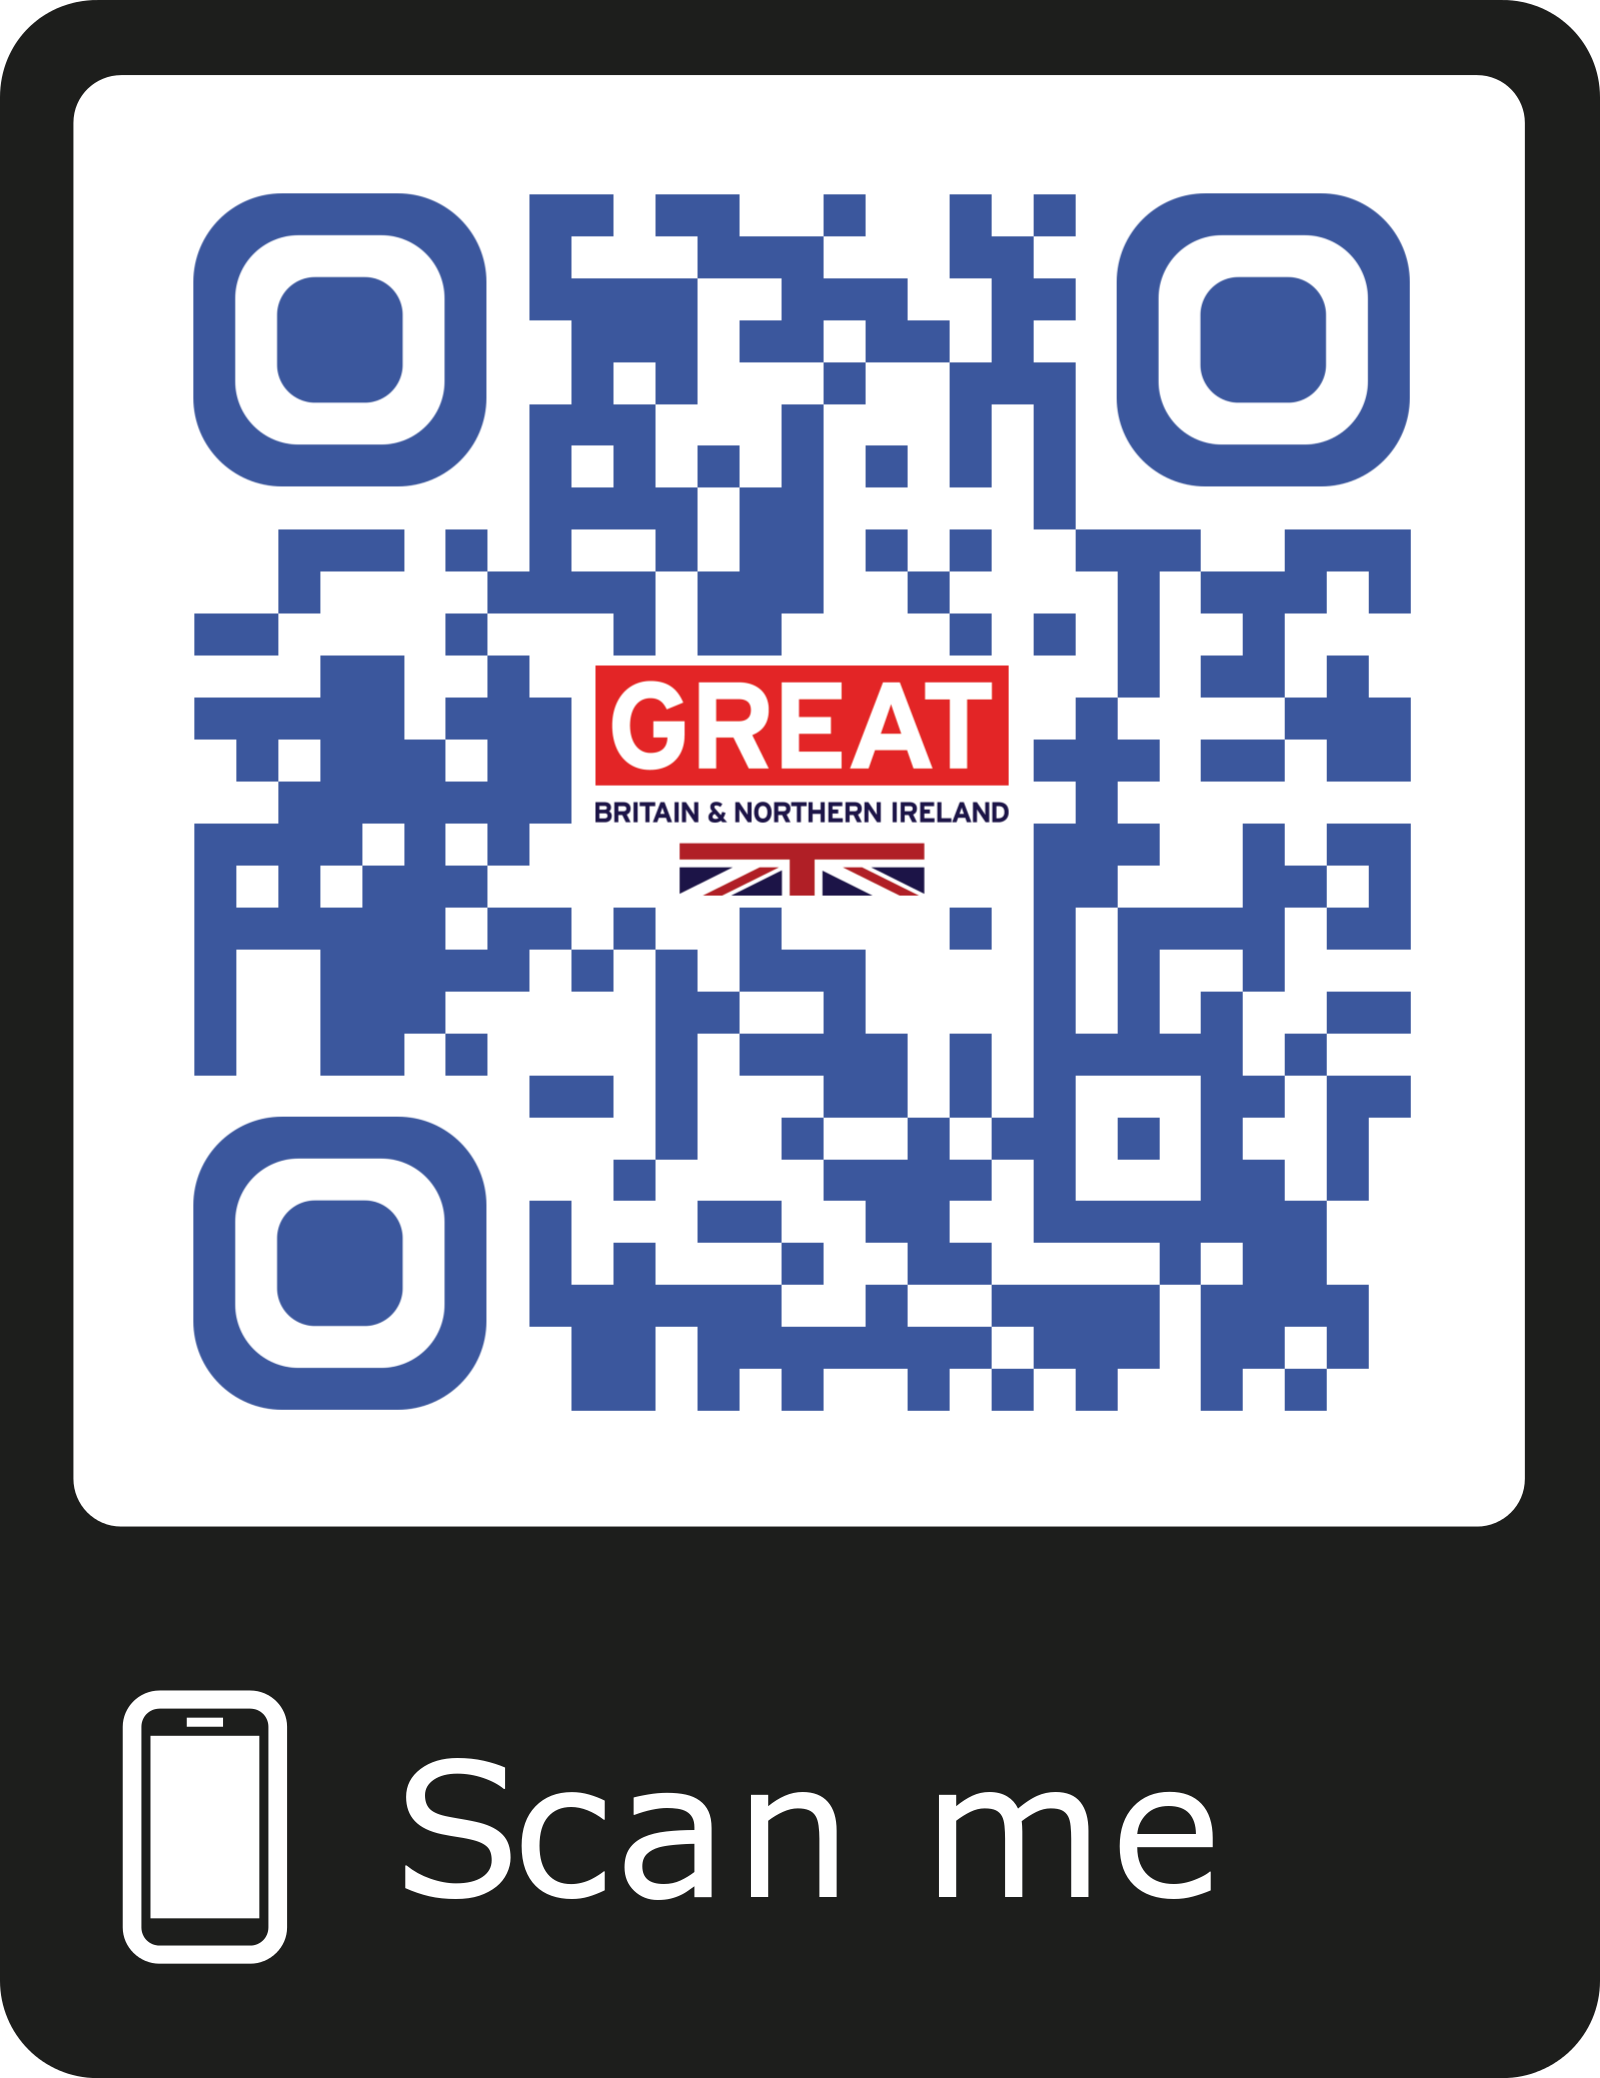 Google Play https://play.google.com/store/apps/details?id=app.eventcloud.ukdit